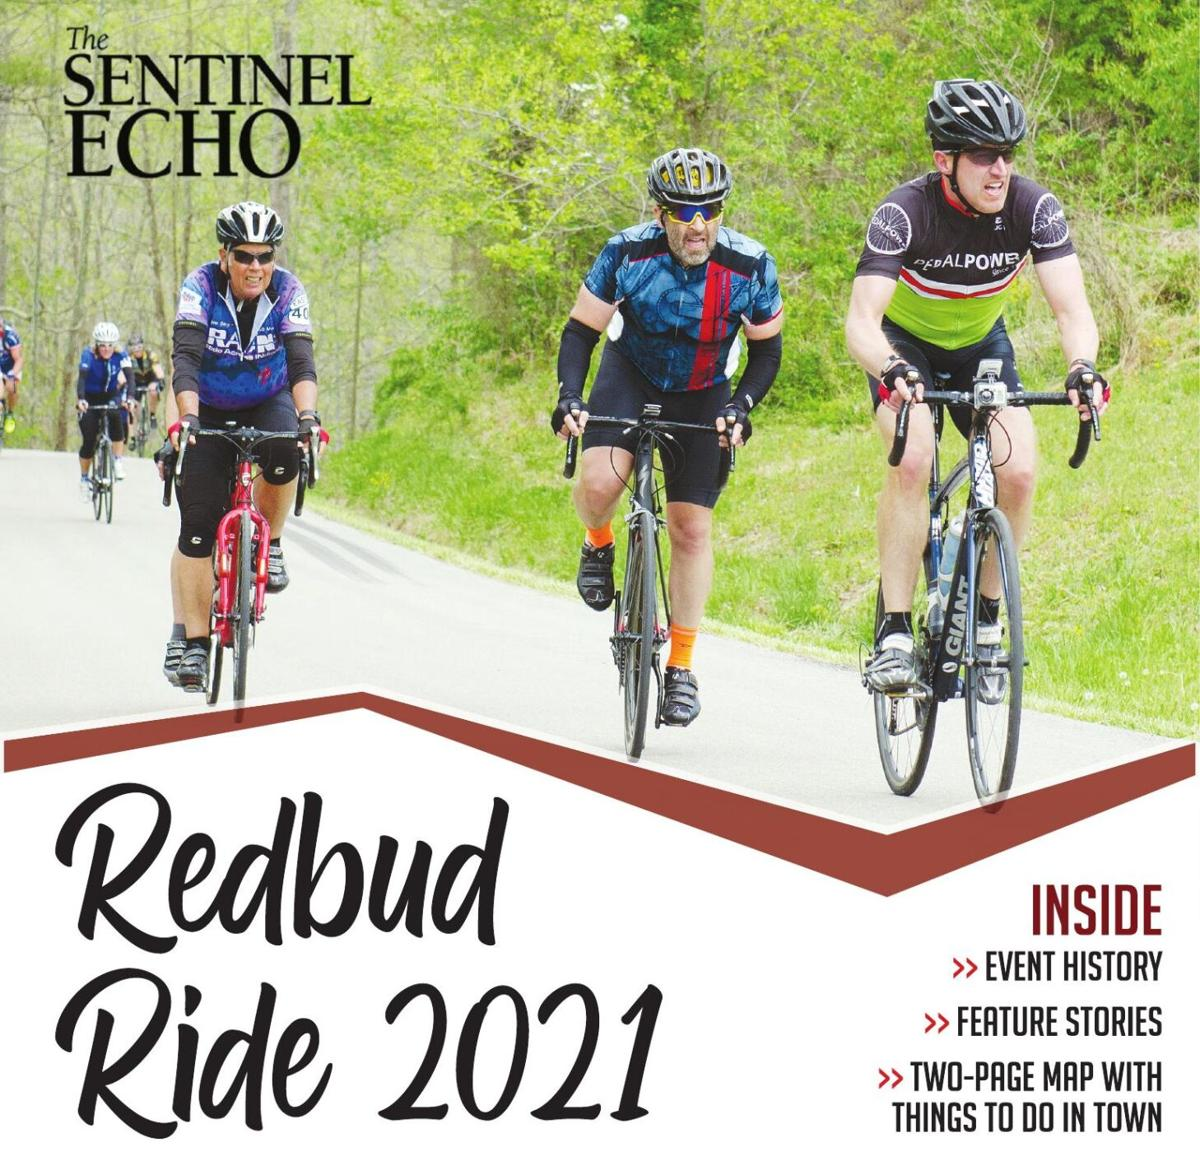 Redbud Ride